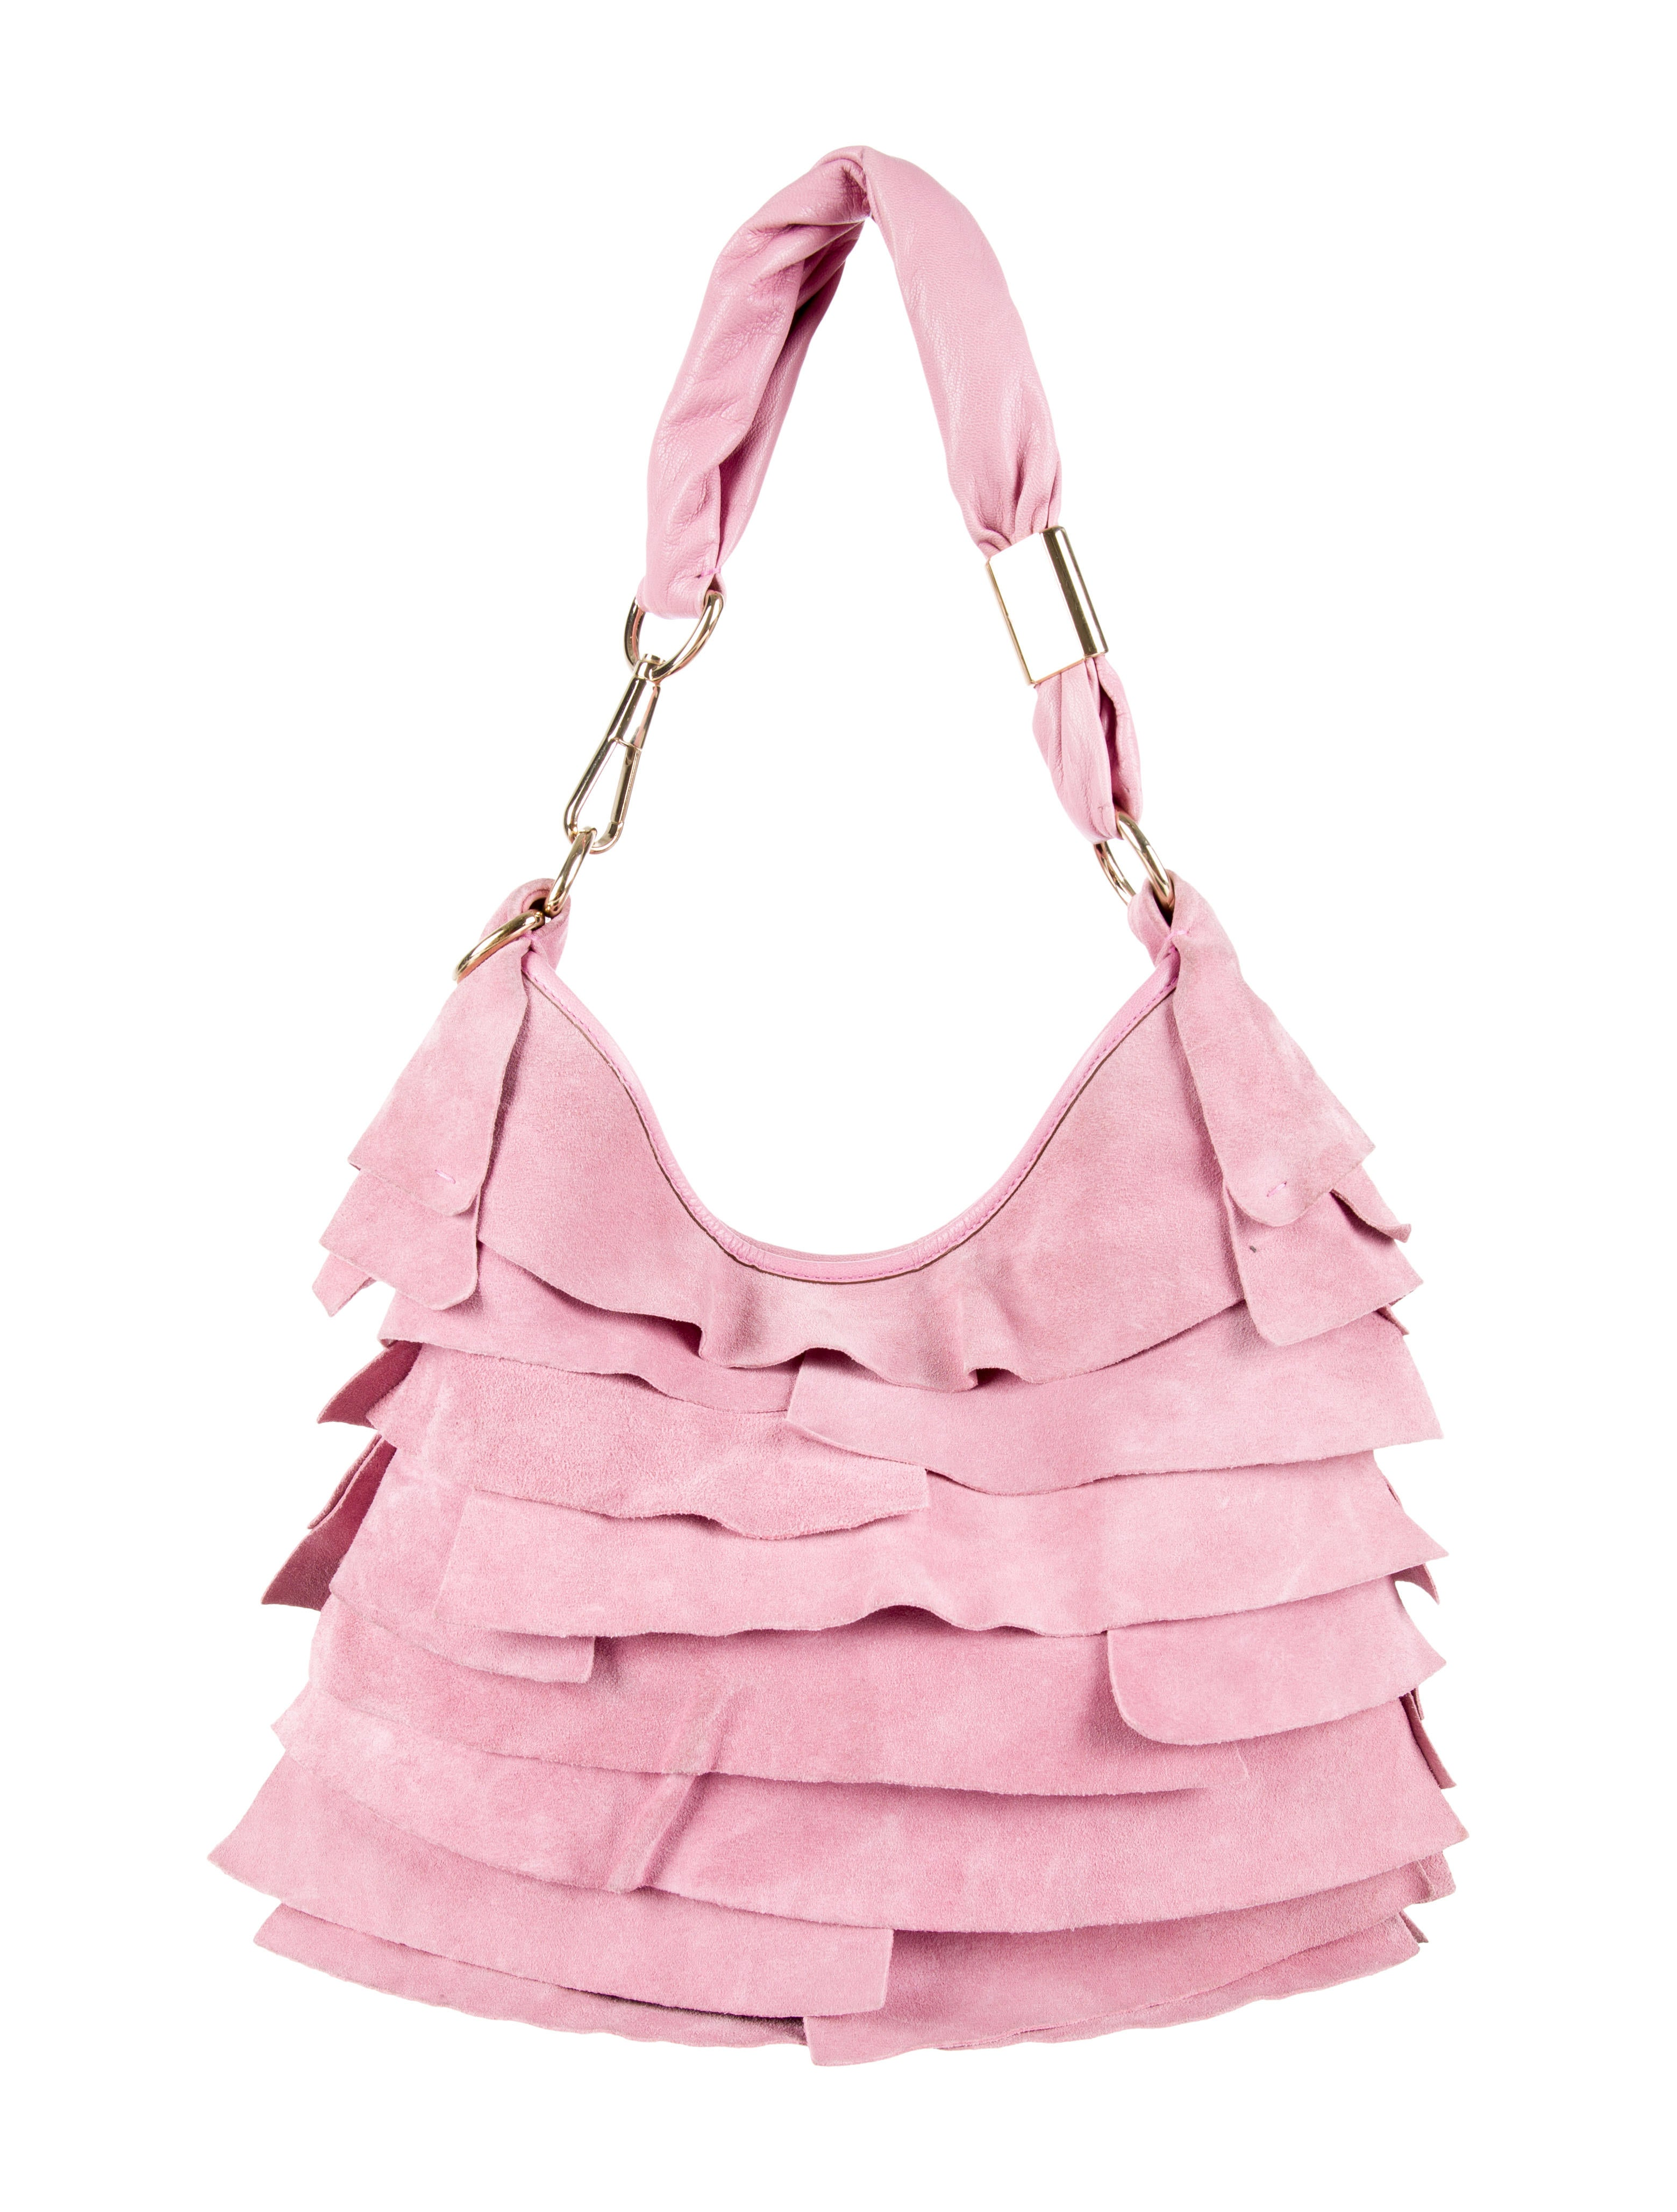 Yves Saint Laurent St. Tropez Bag - Handbags - YVE36346 | The RealReal